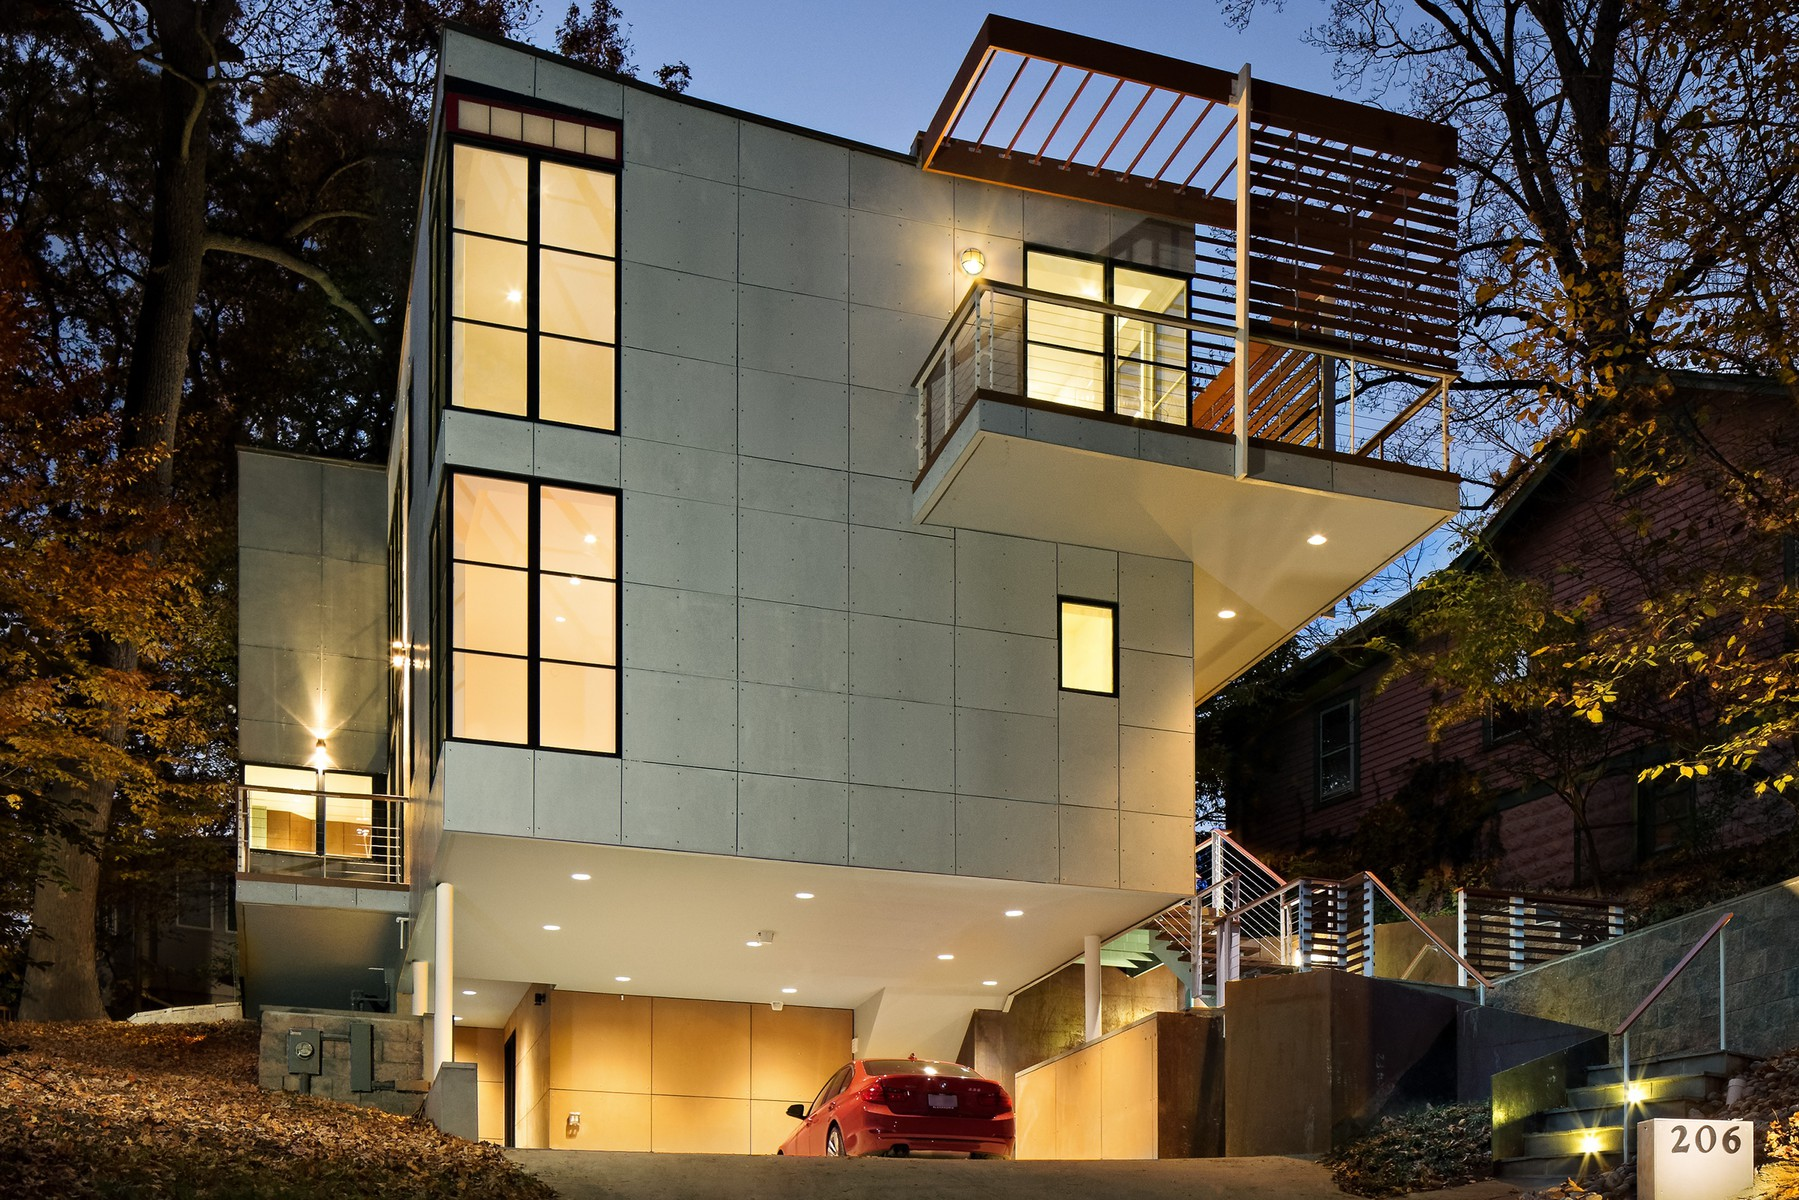 Villa per Vendita alle ore 206 Domer Avenue, Takoma Park Takoma Park, Maryland 20912 Stati Uniti